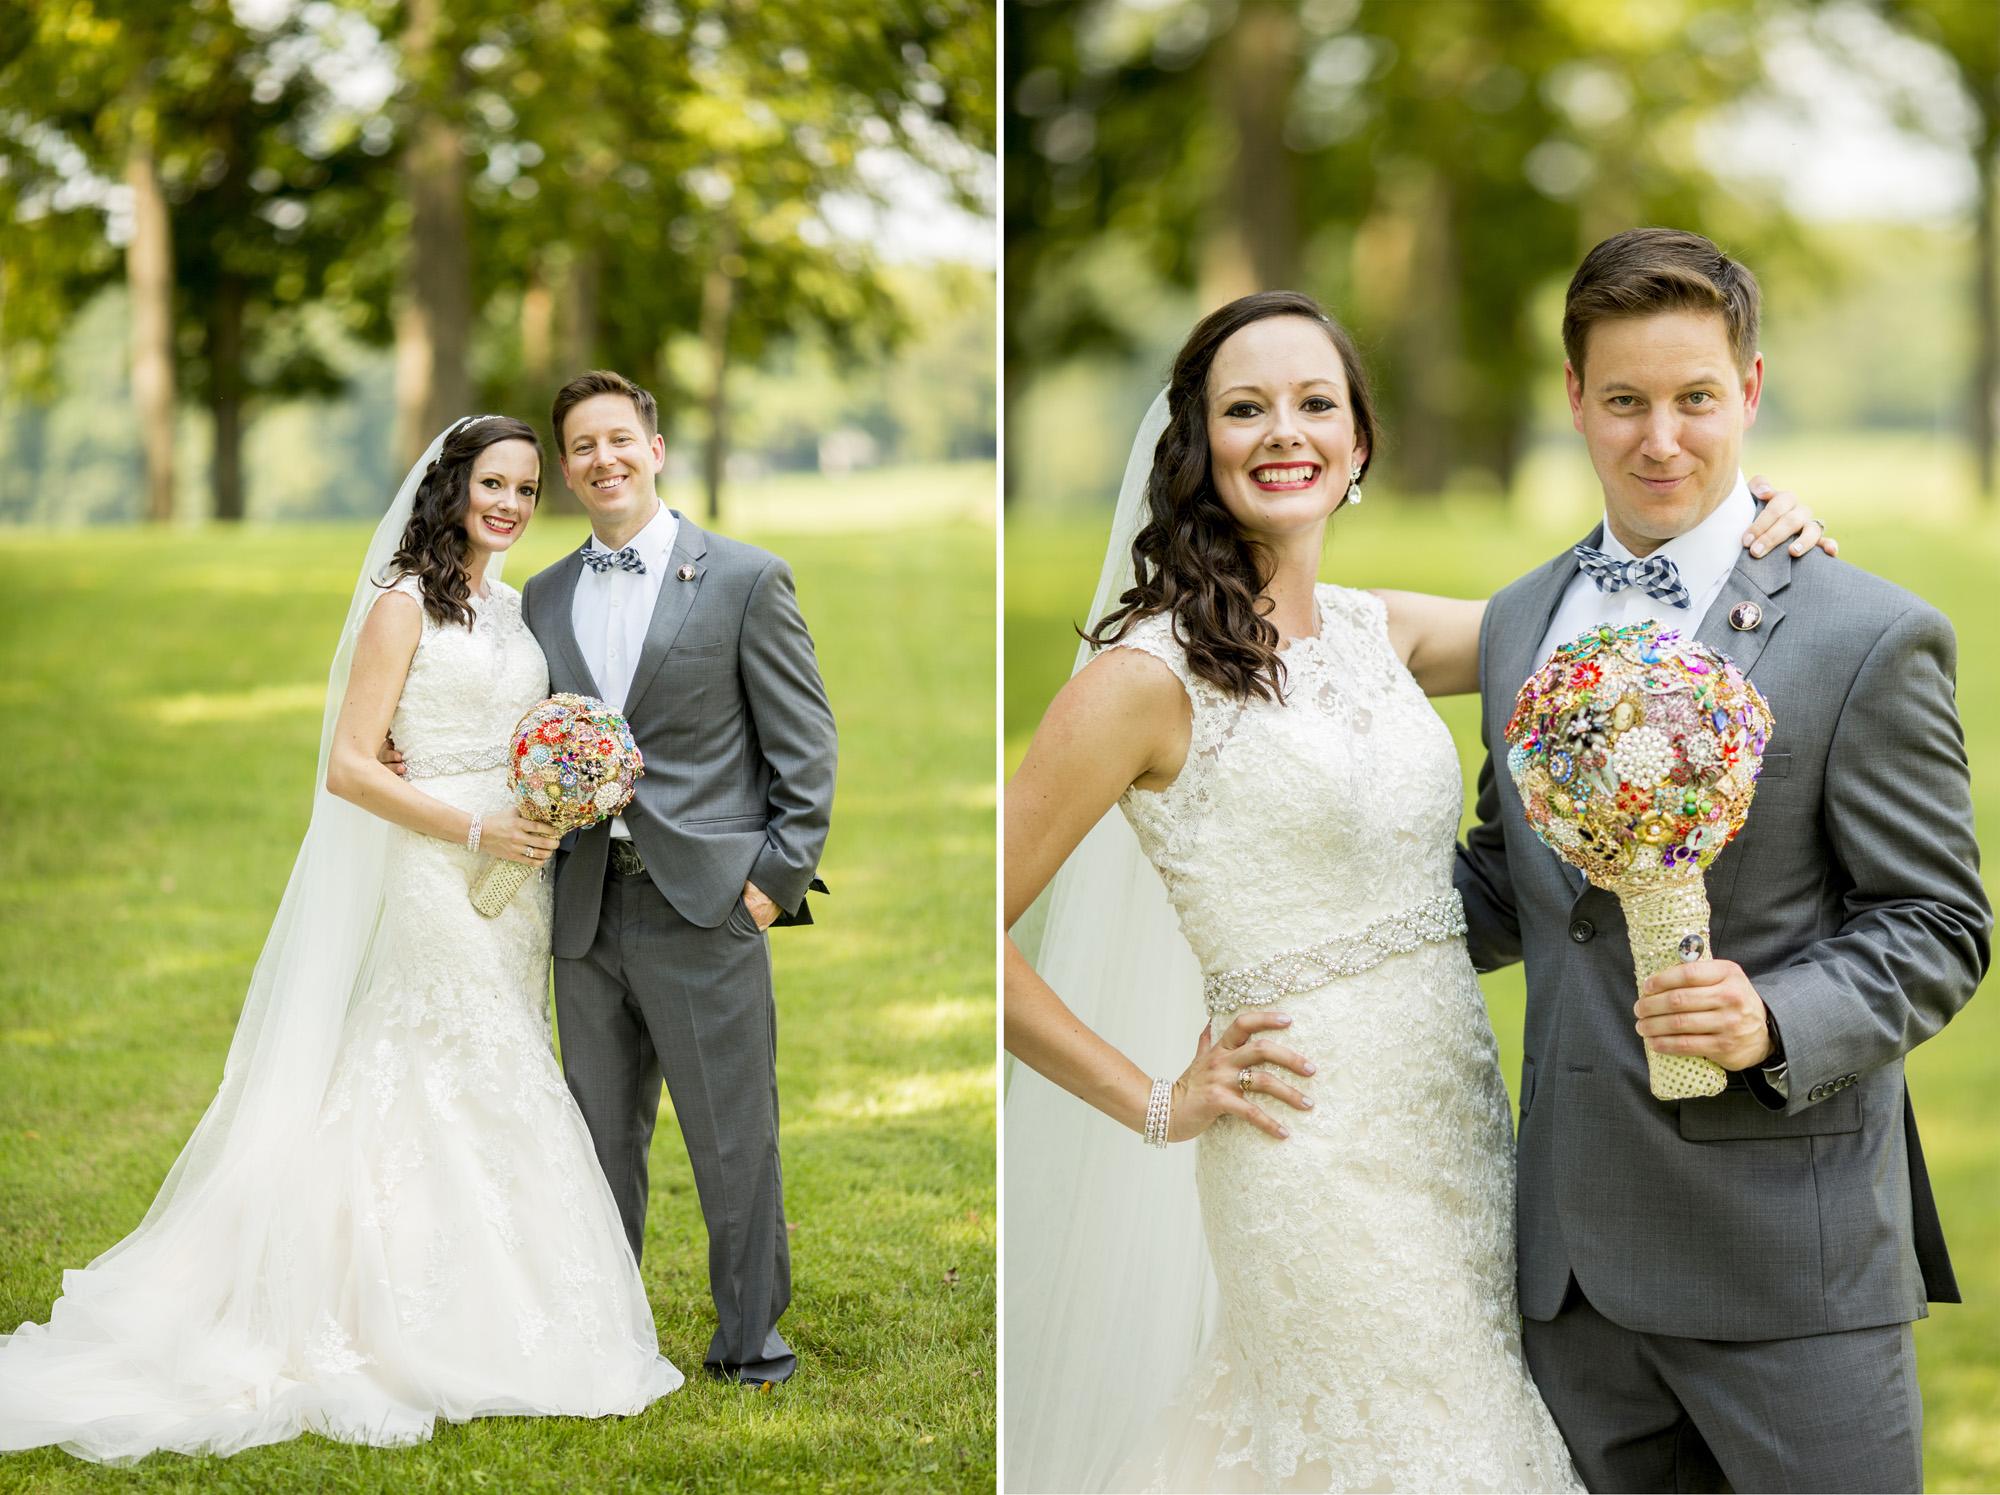 Seriously_Sabrina_Photography_Bowling_Green_Kentucky_Highland_Stables_Wedding_Wolff49.jpg